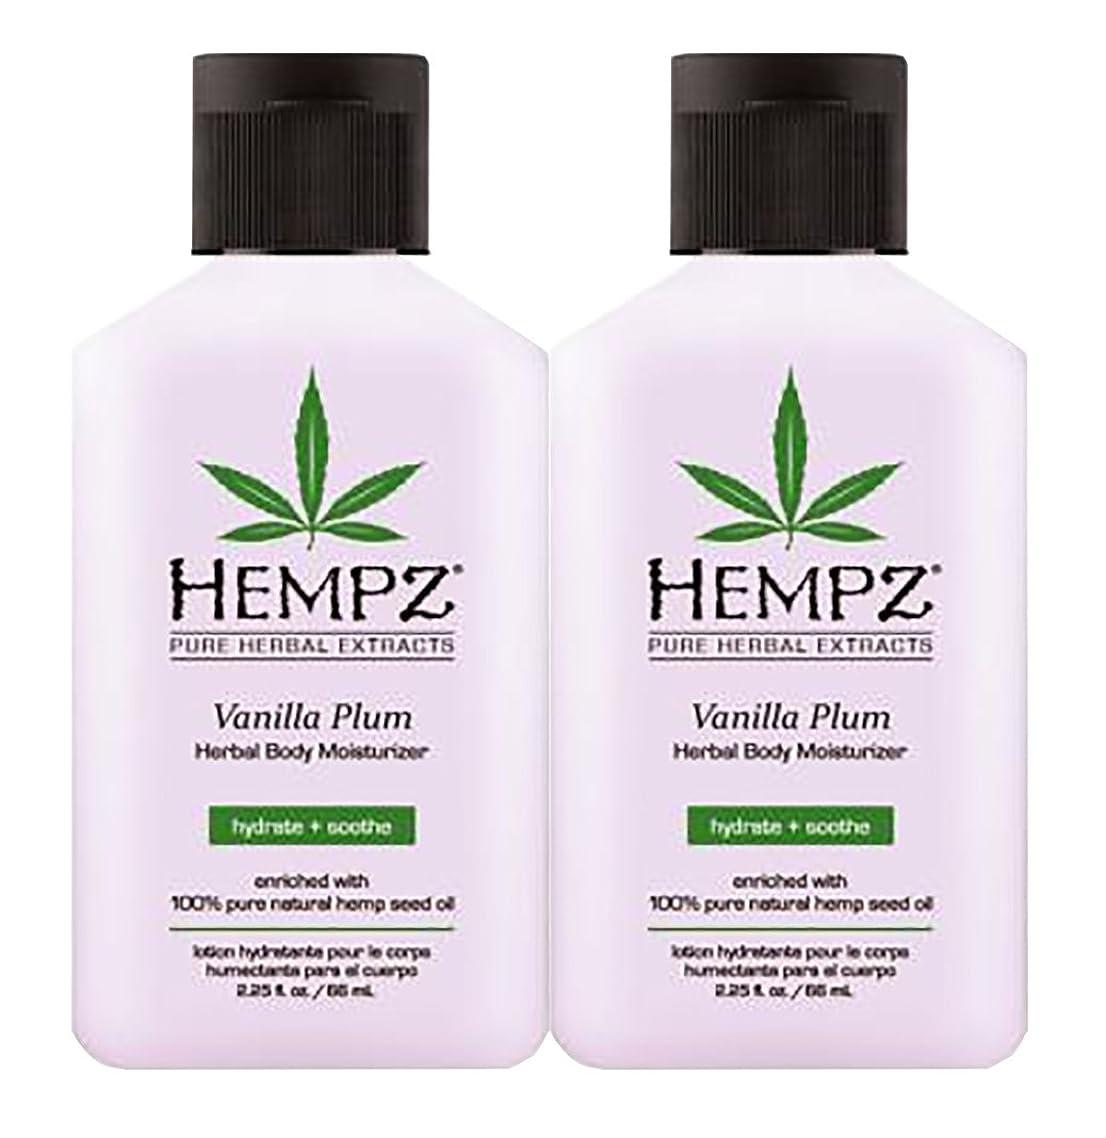 Hempz Vanilla Plum Herbal Mosturizer 2.25oz Pack of 2 - New